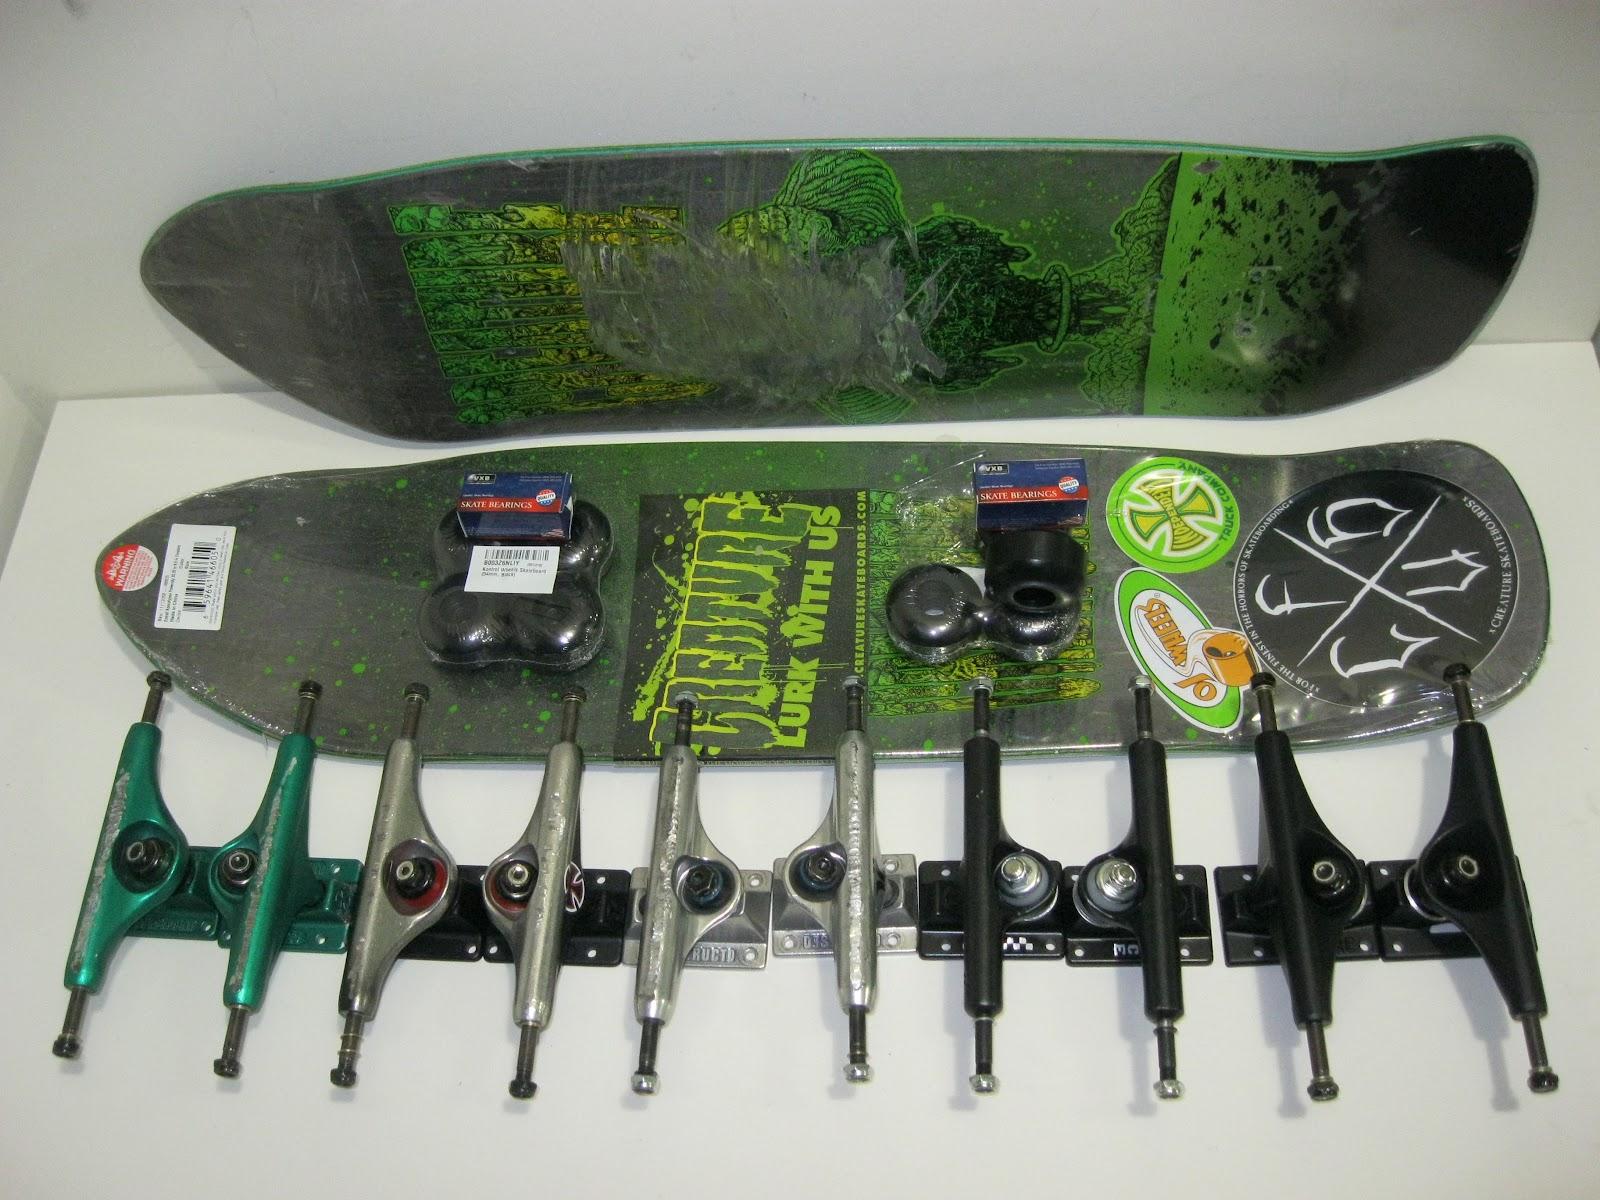 Skateboarding Is My Lifetime Sport: Preparations: 149 truck test